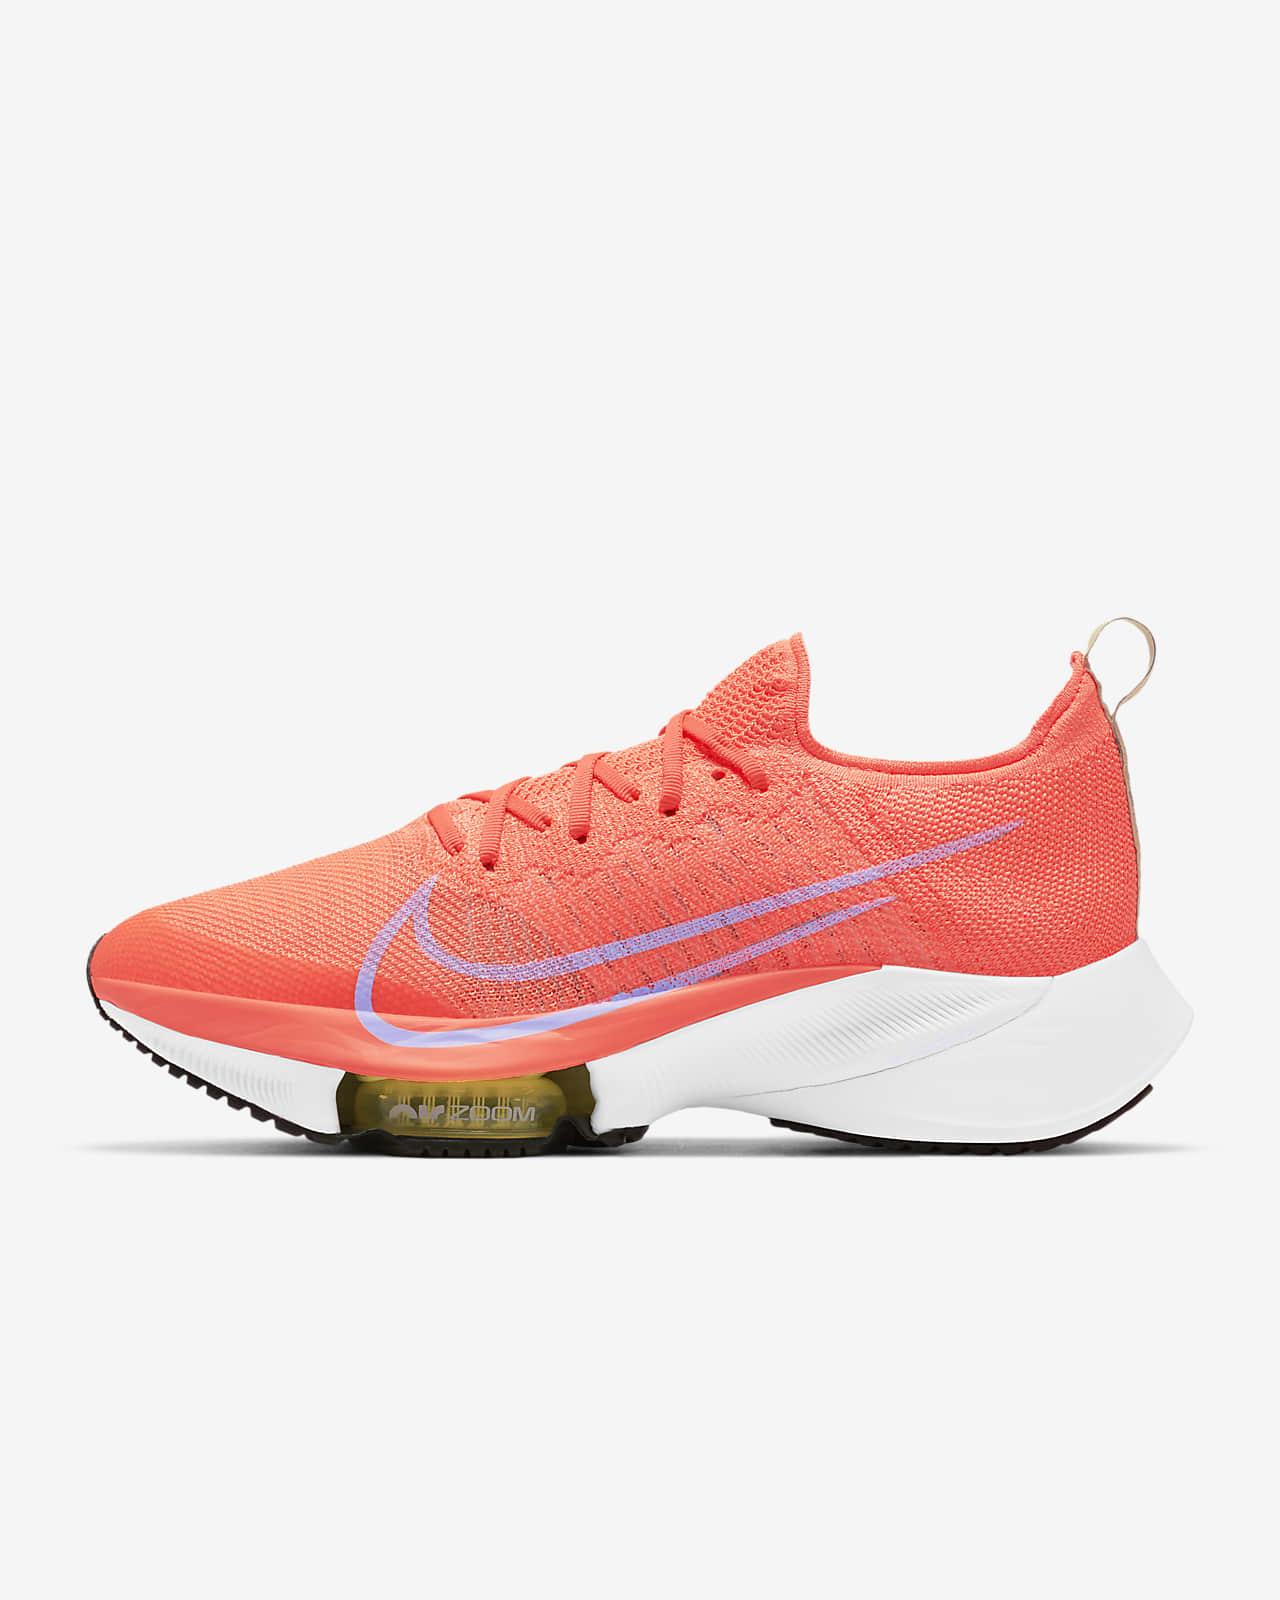 refugiados materno preocupación  Nike Air Zoom Tempo NEXT% Women's Running Shoe. Nike AU